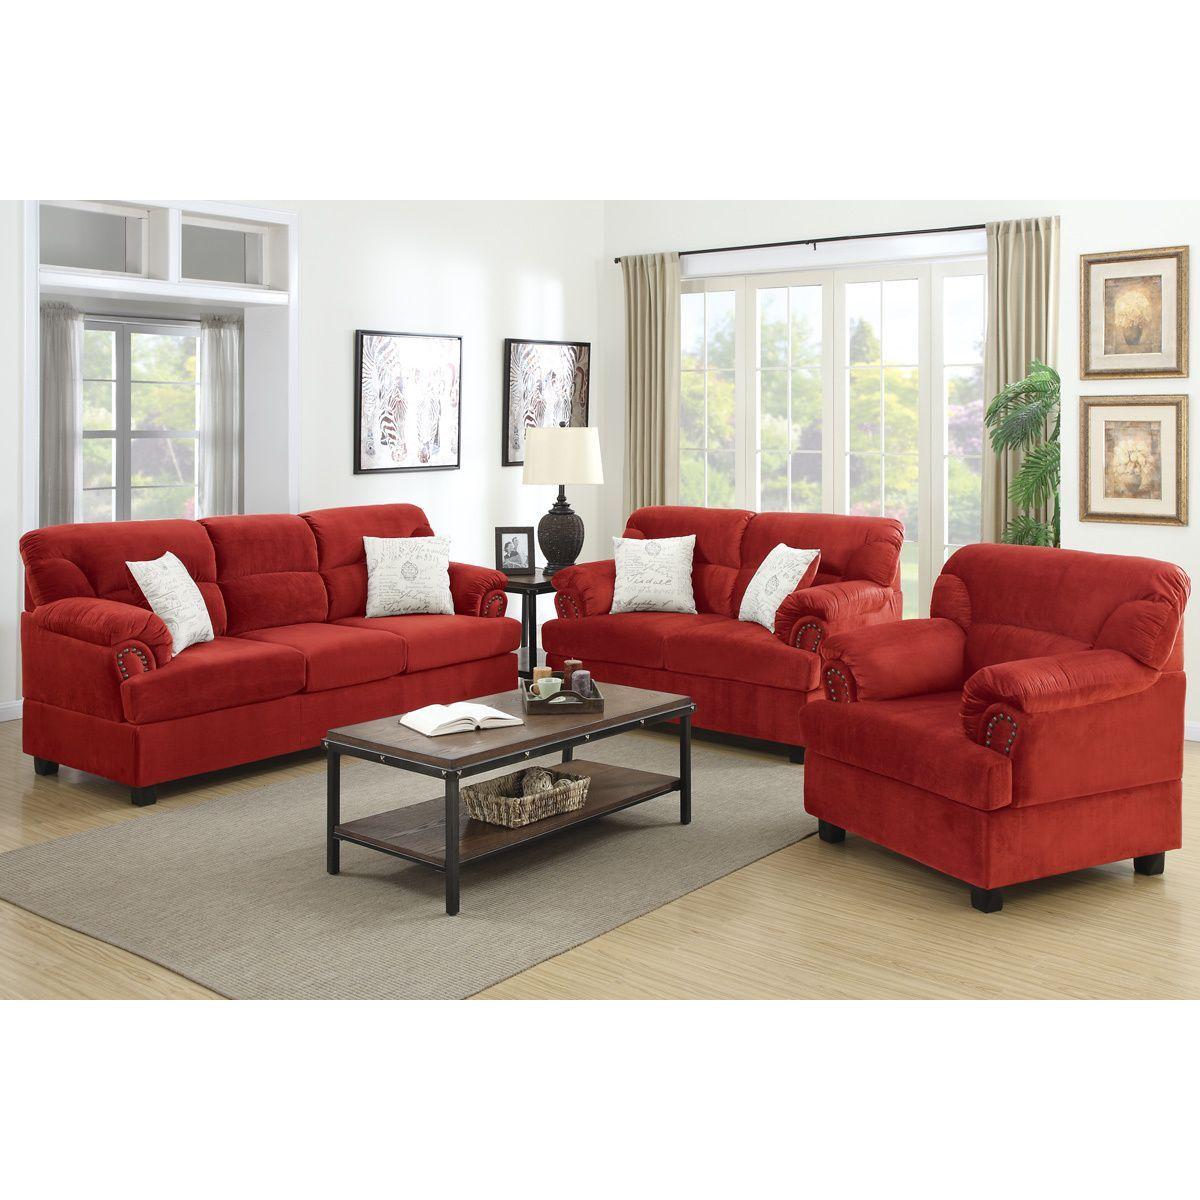 Best Poundex Junik 3 Piece Living Room Set In Microfiber Red 640 x 480